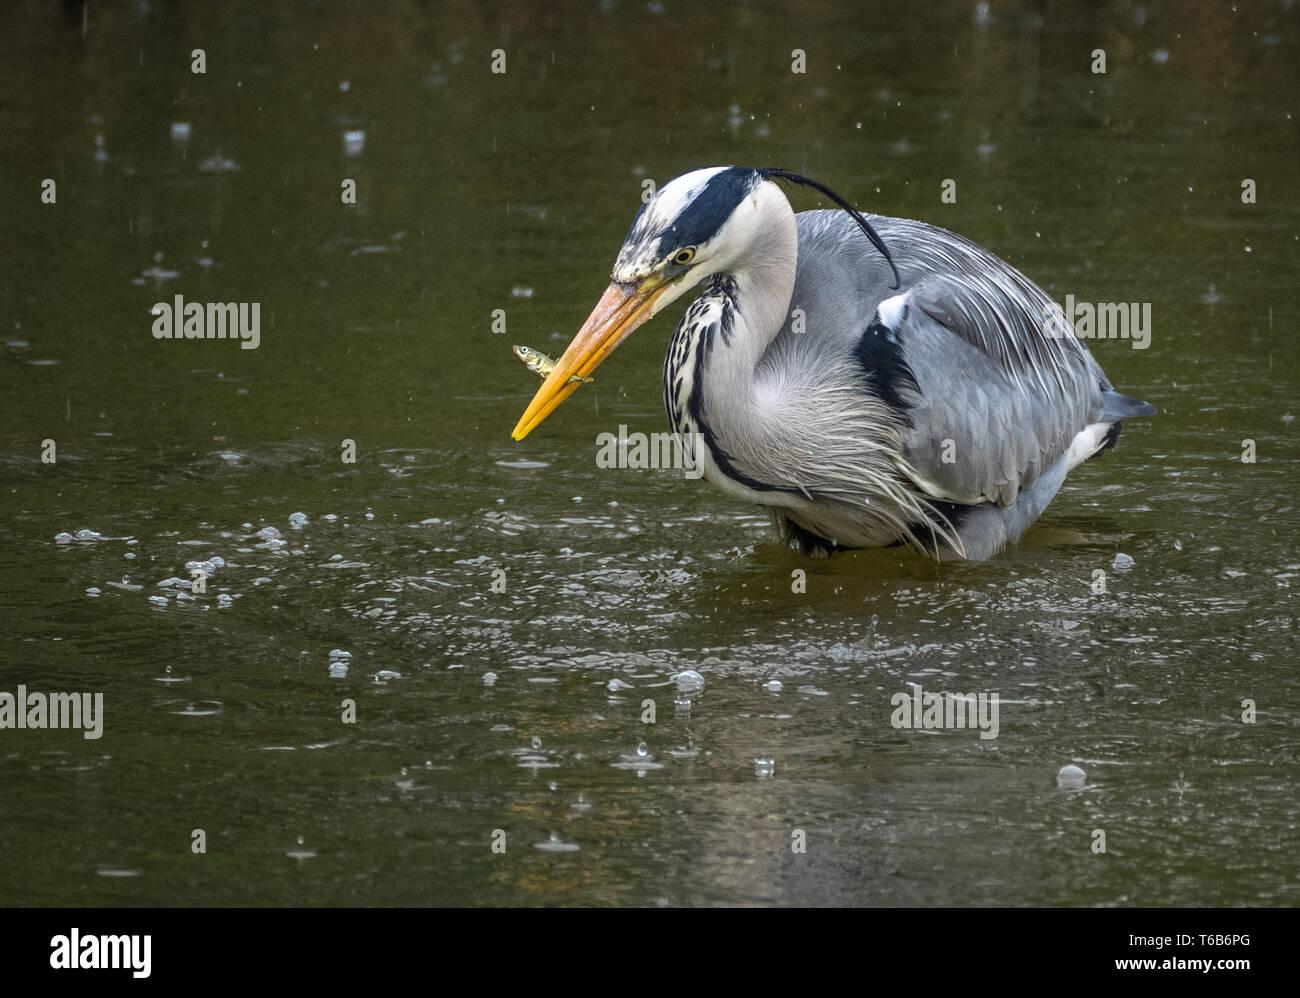 Heron catching minnow, Welsh Wildlife Centre, Cilgerran, Wales Stock Photo